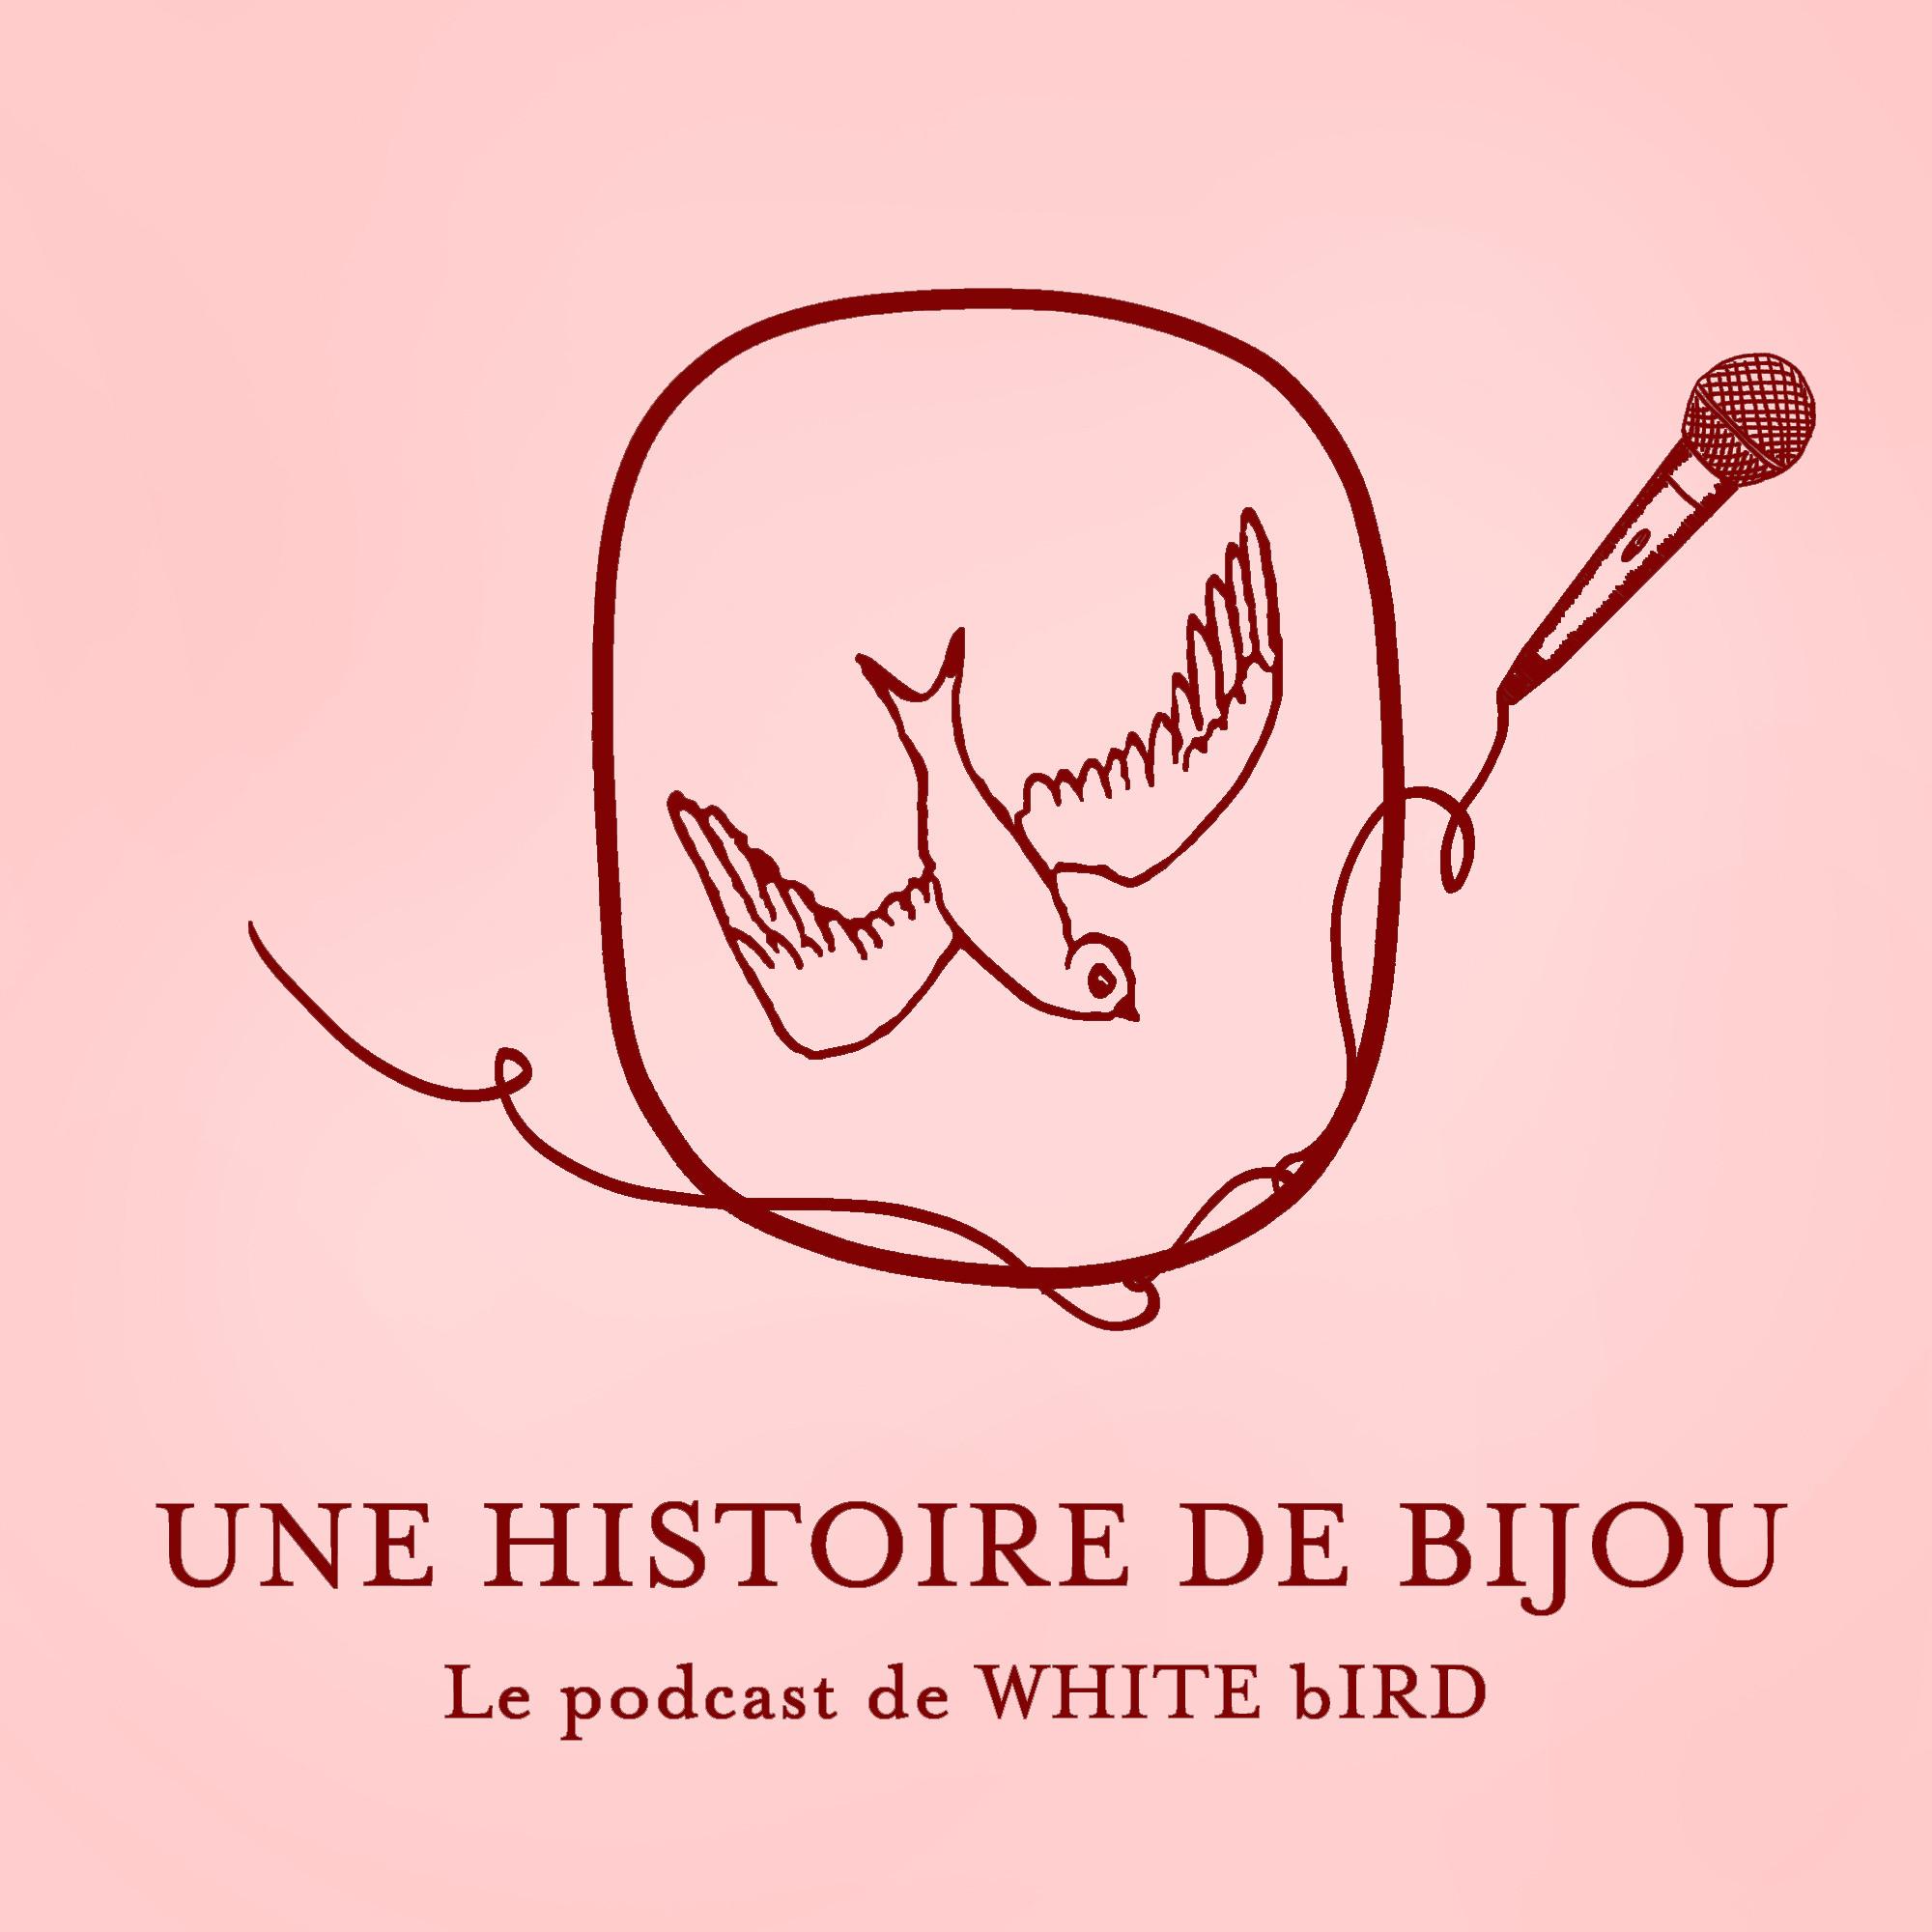 UNE HISTOIRE DE BIJOU